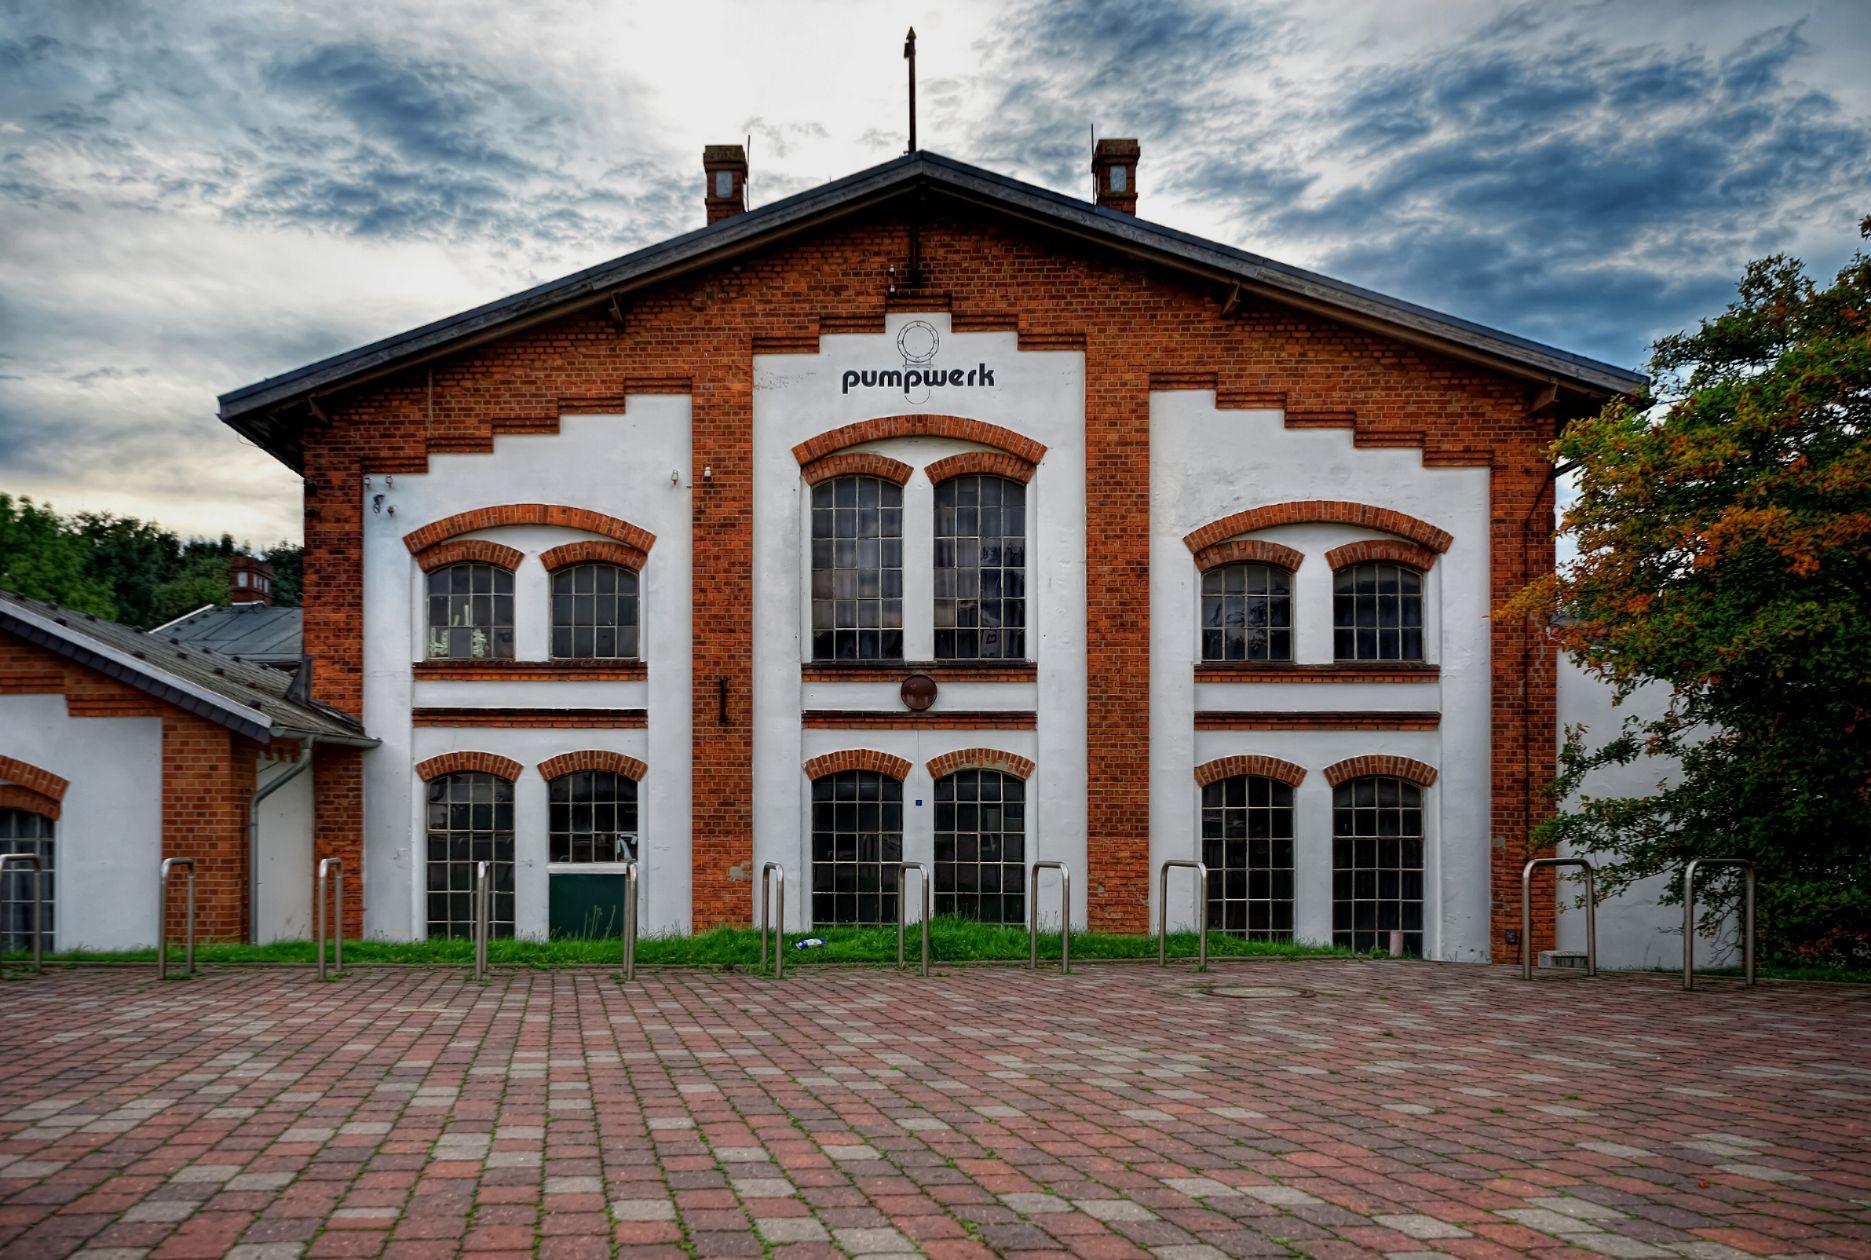 Kulturzentrum Pumpwerk